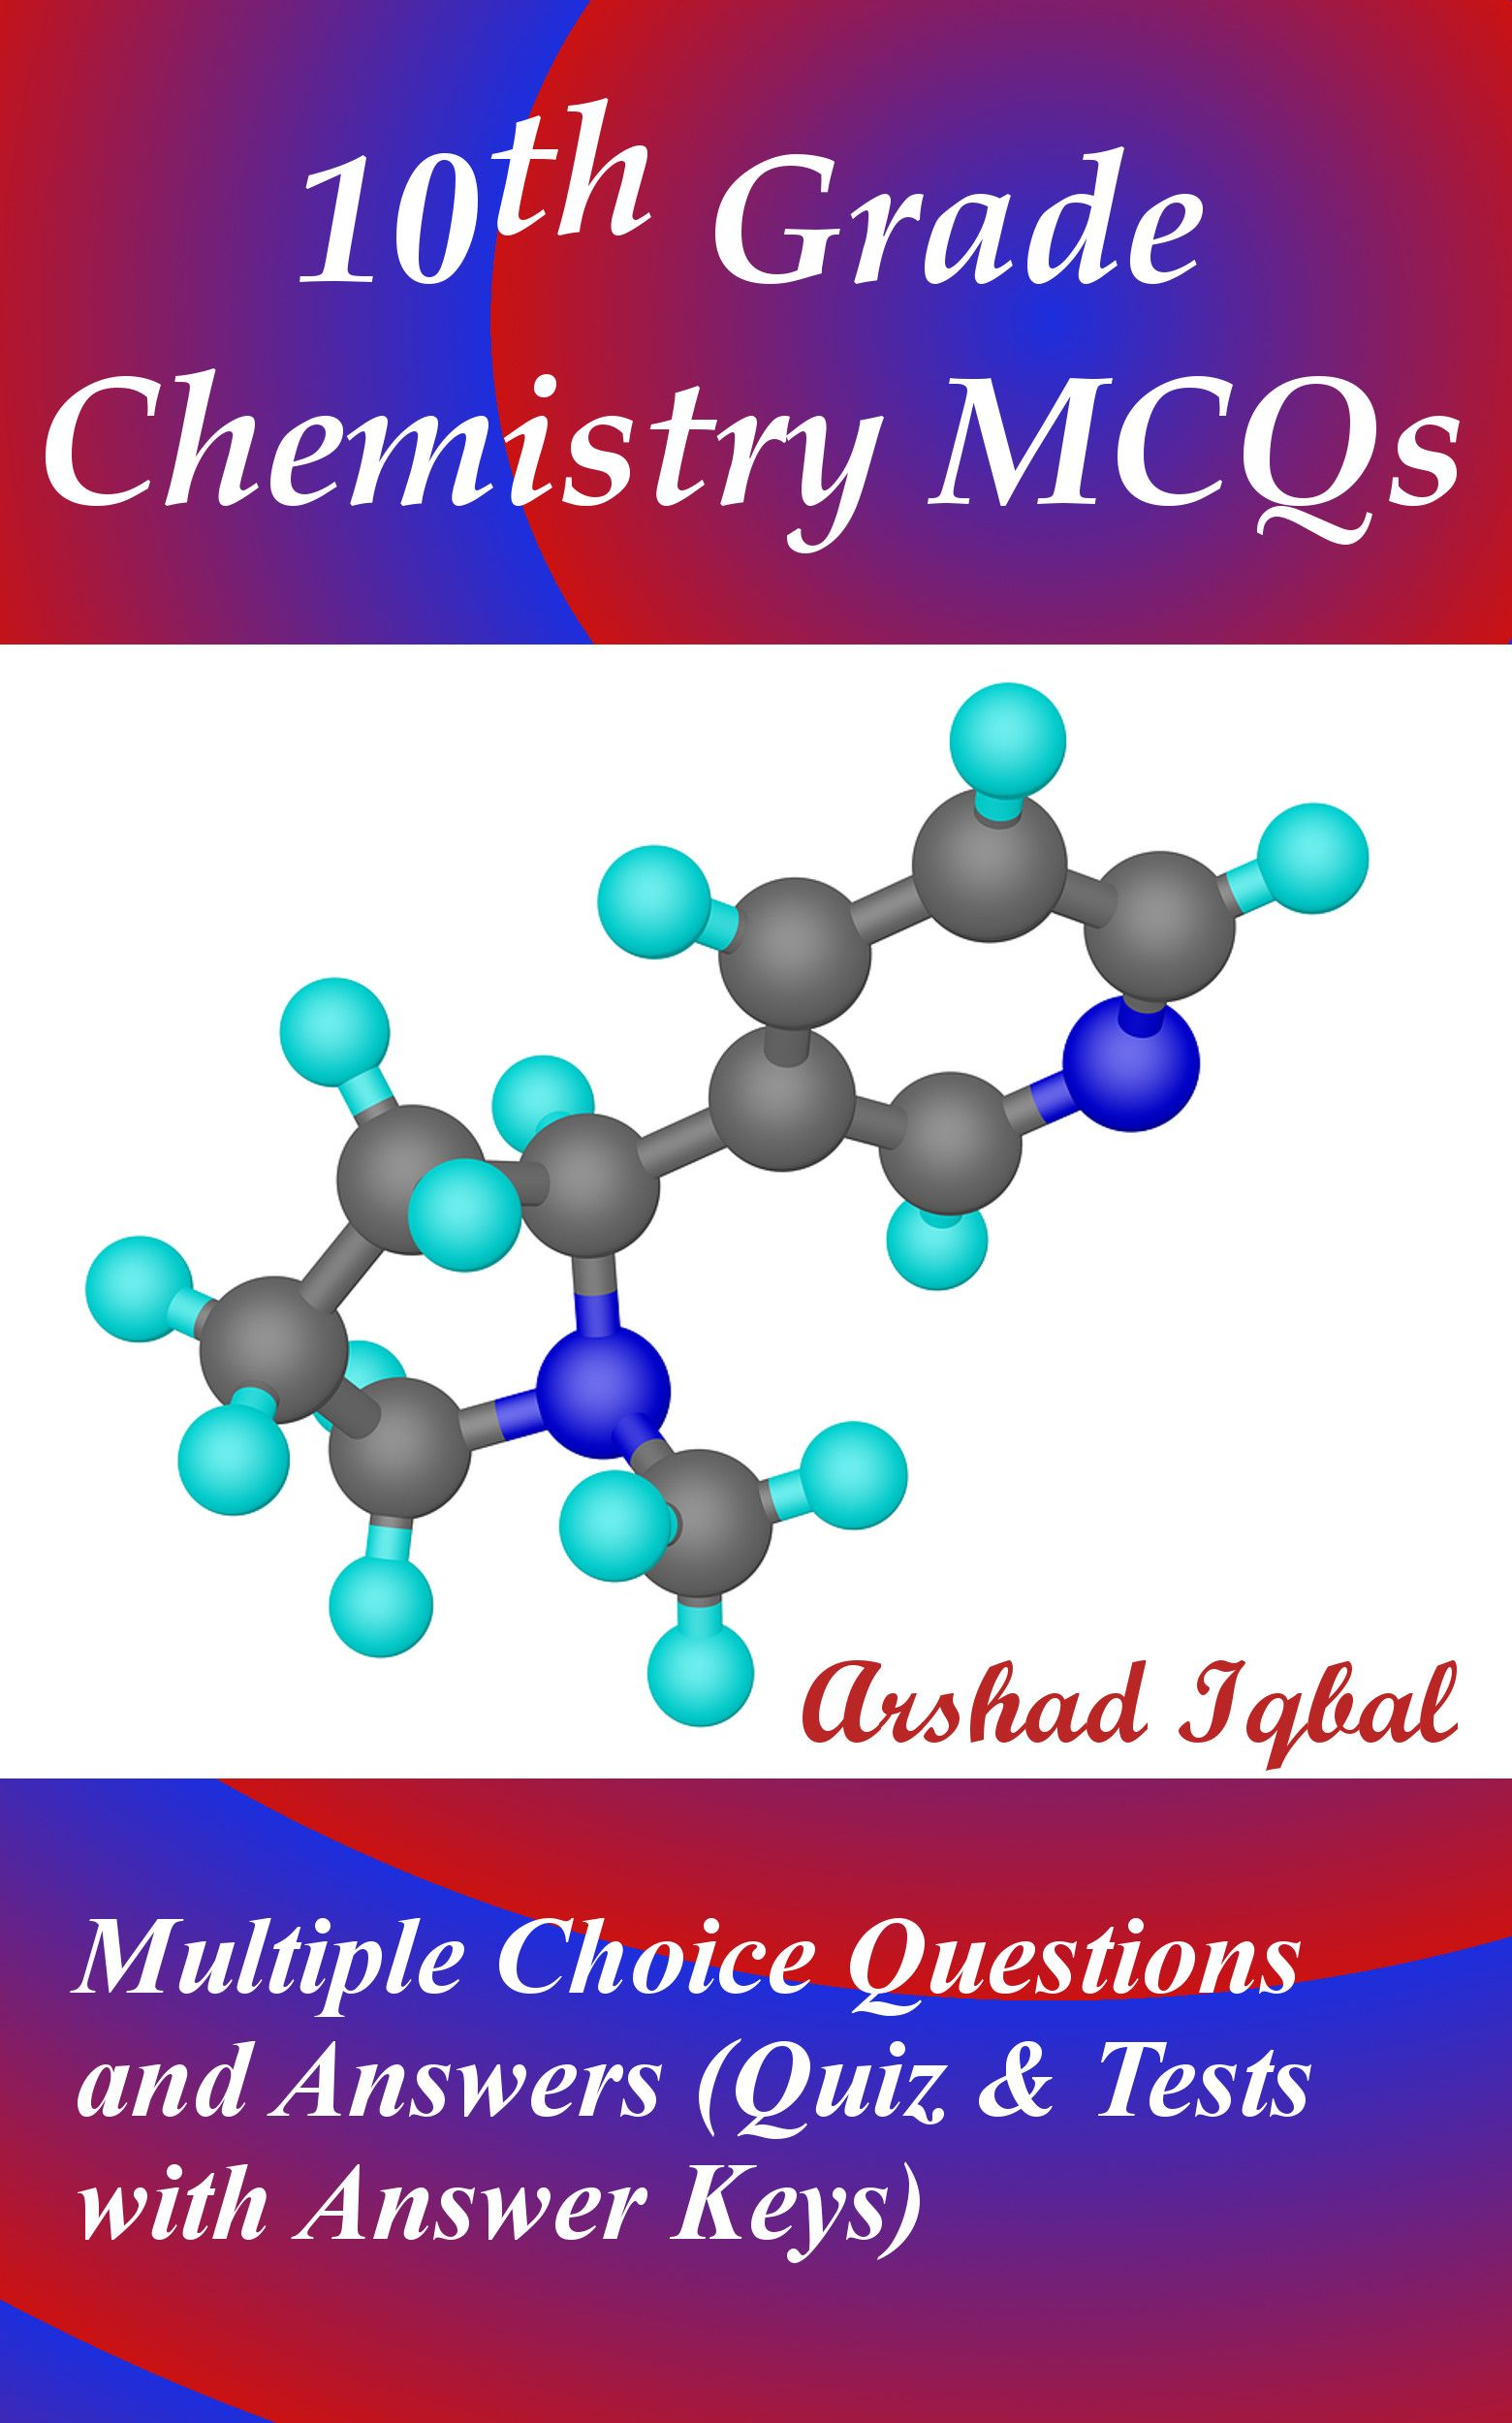 Inorganic chemistry, chemistry, biochemistry, chemical equilibrium